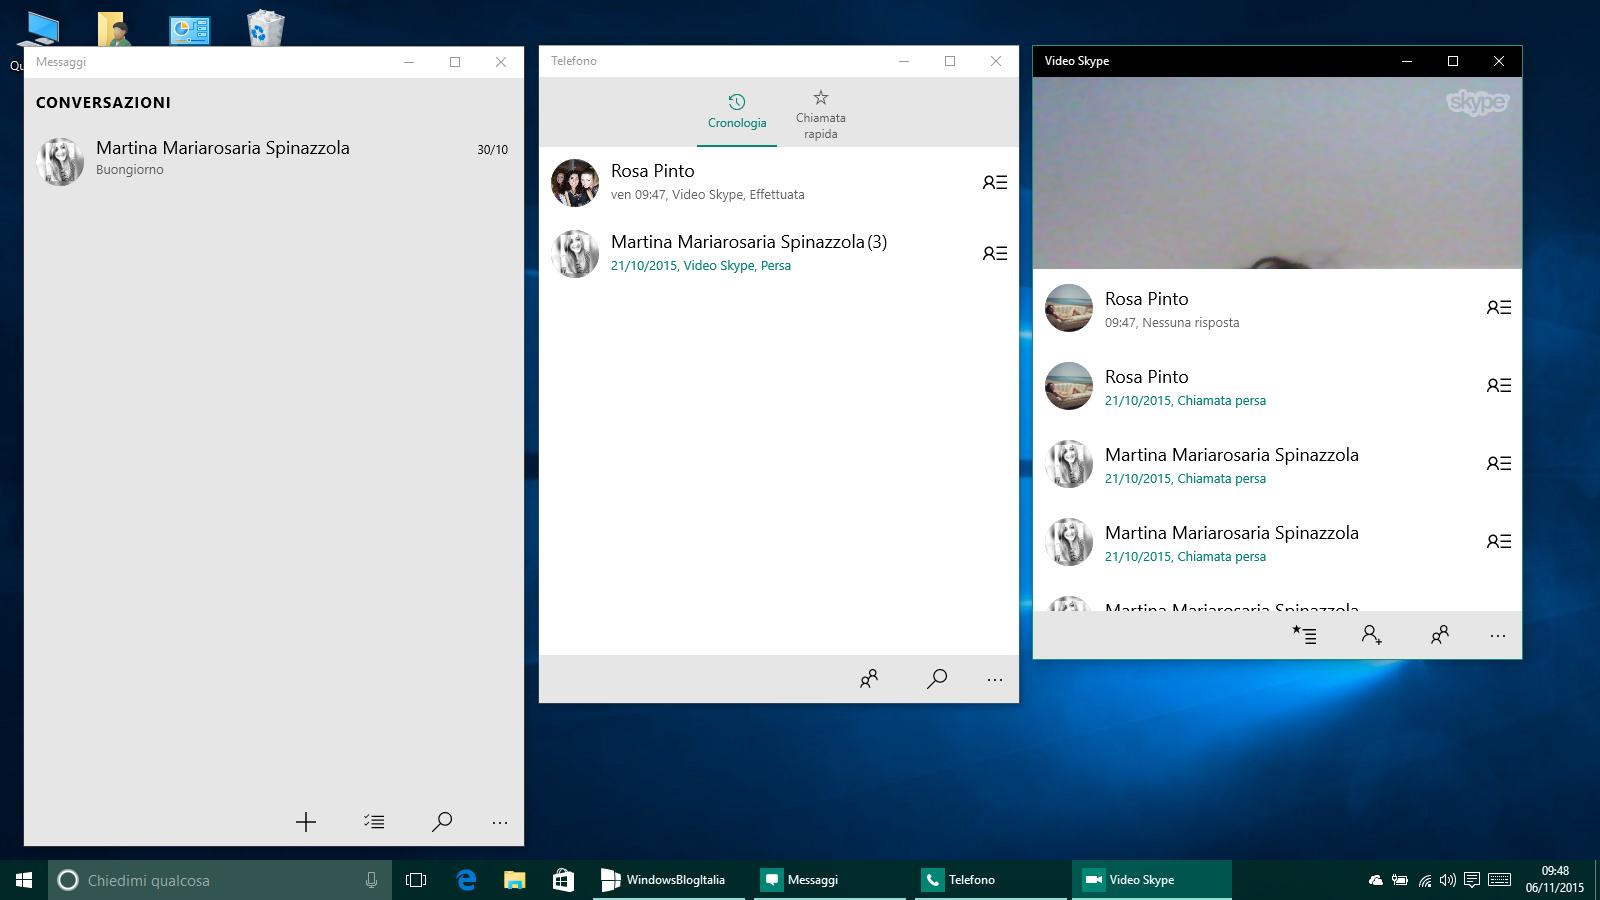 Telefono, messaggi e video skype